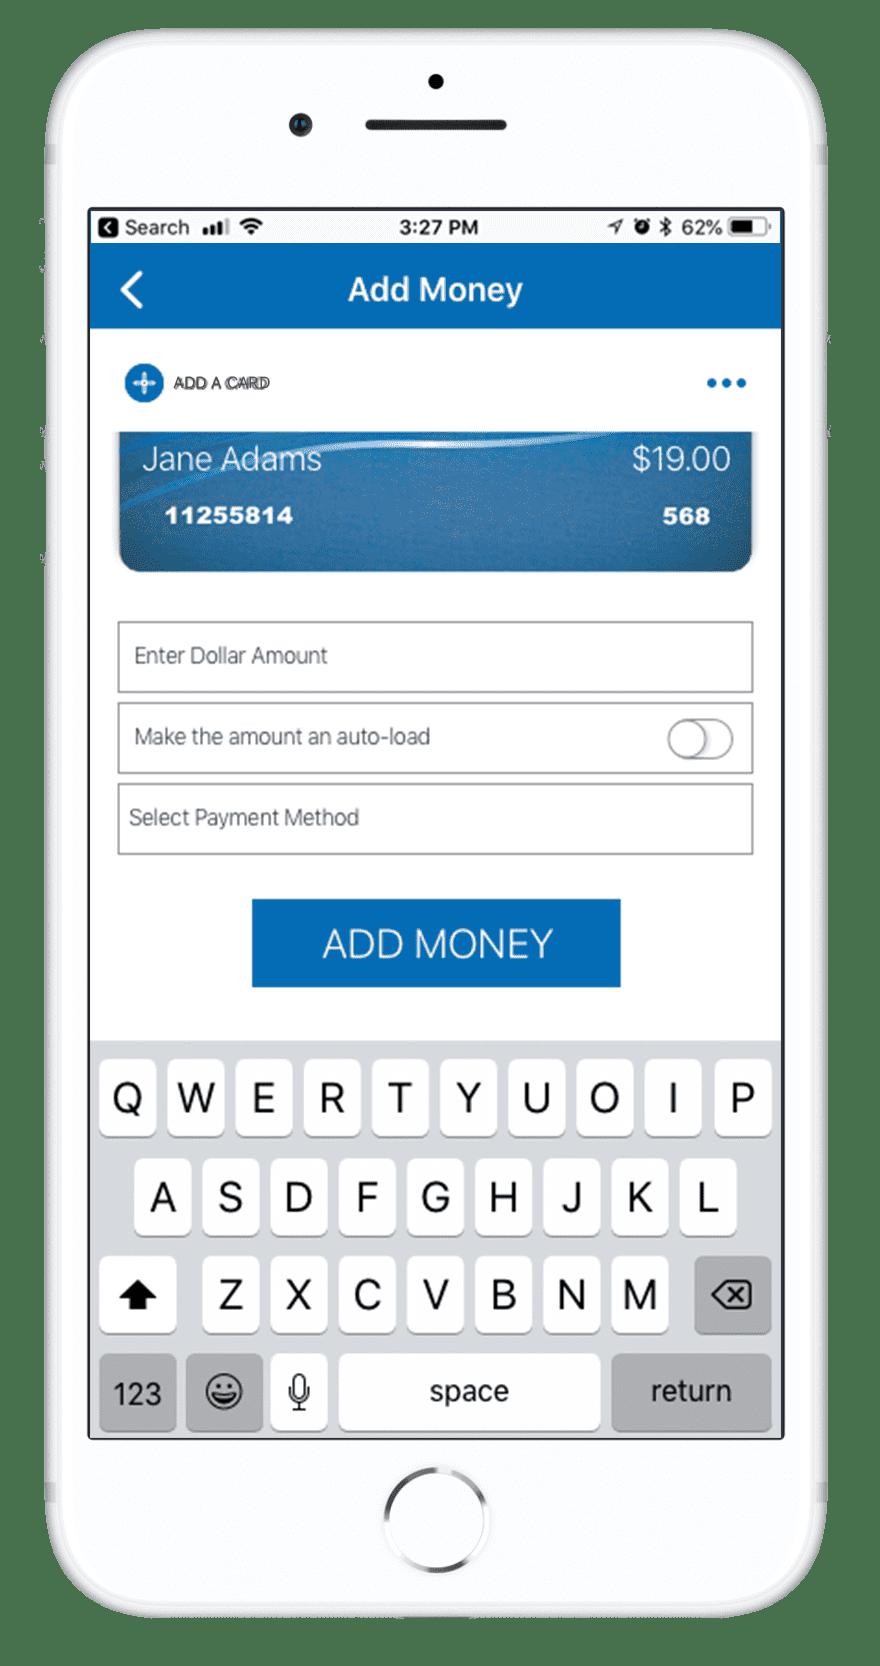 Orca Card 2 - Add a Money Screen